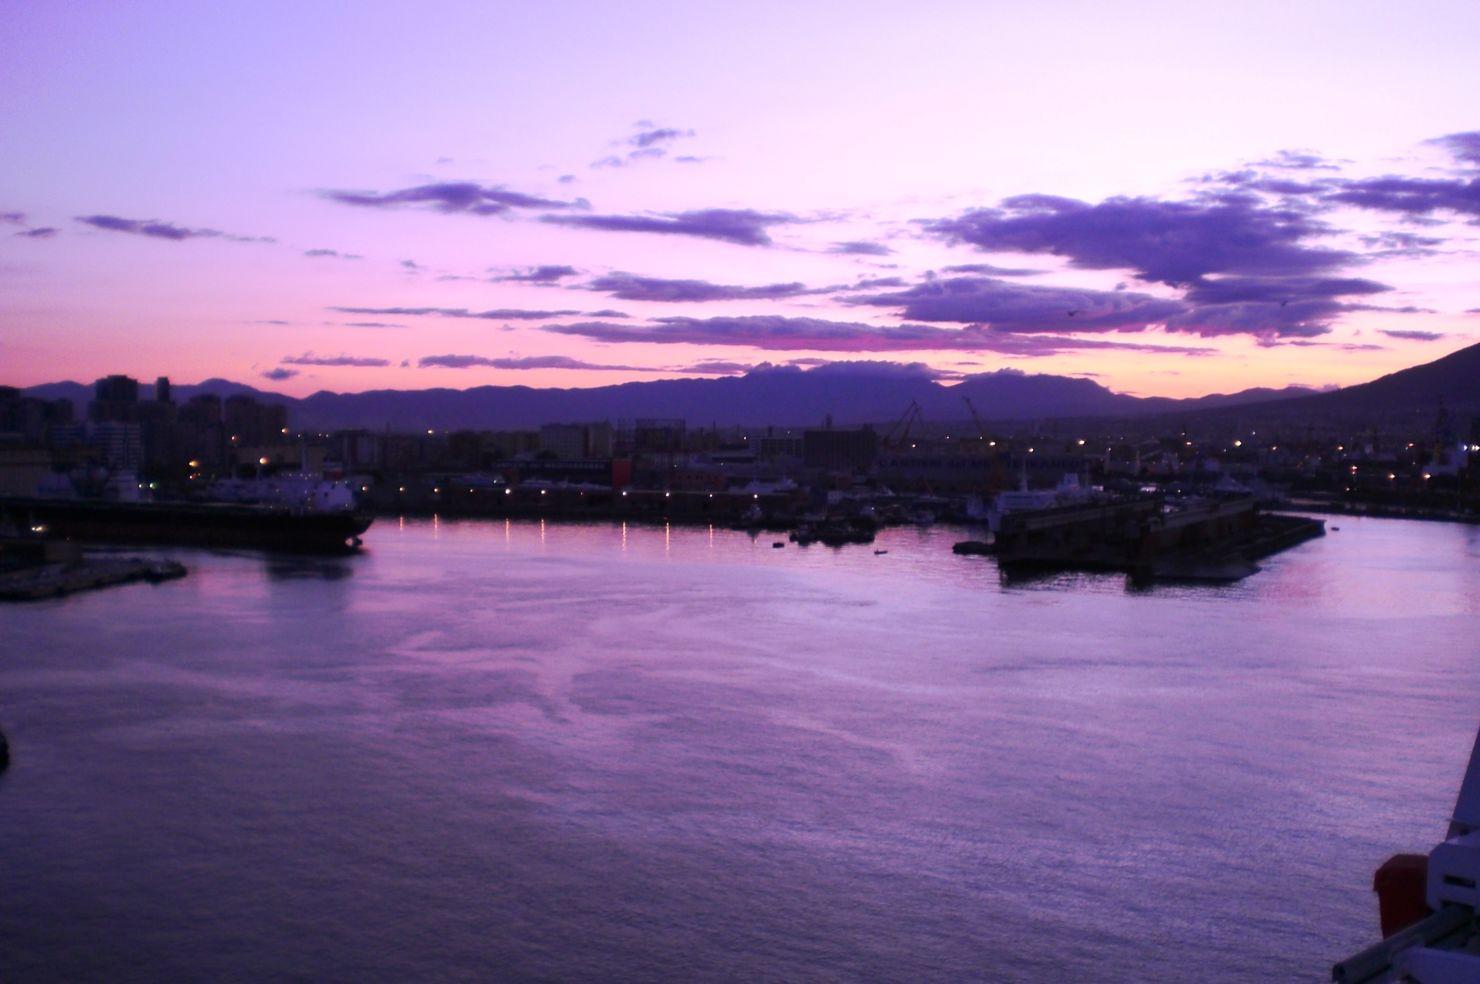 A purple sunrise over Palermo, Sicily